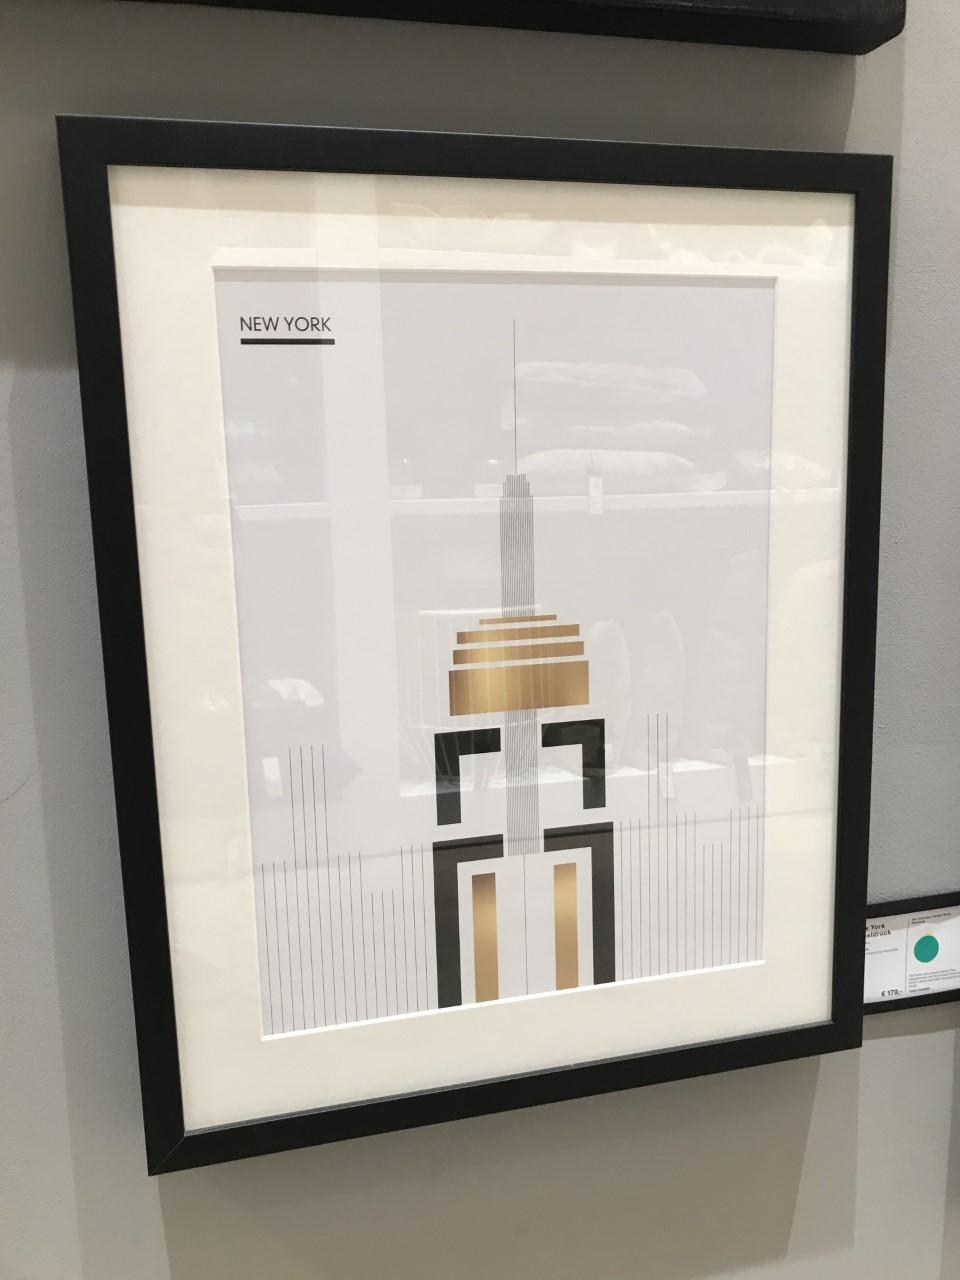 New York Kunstdruck